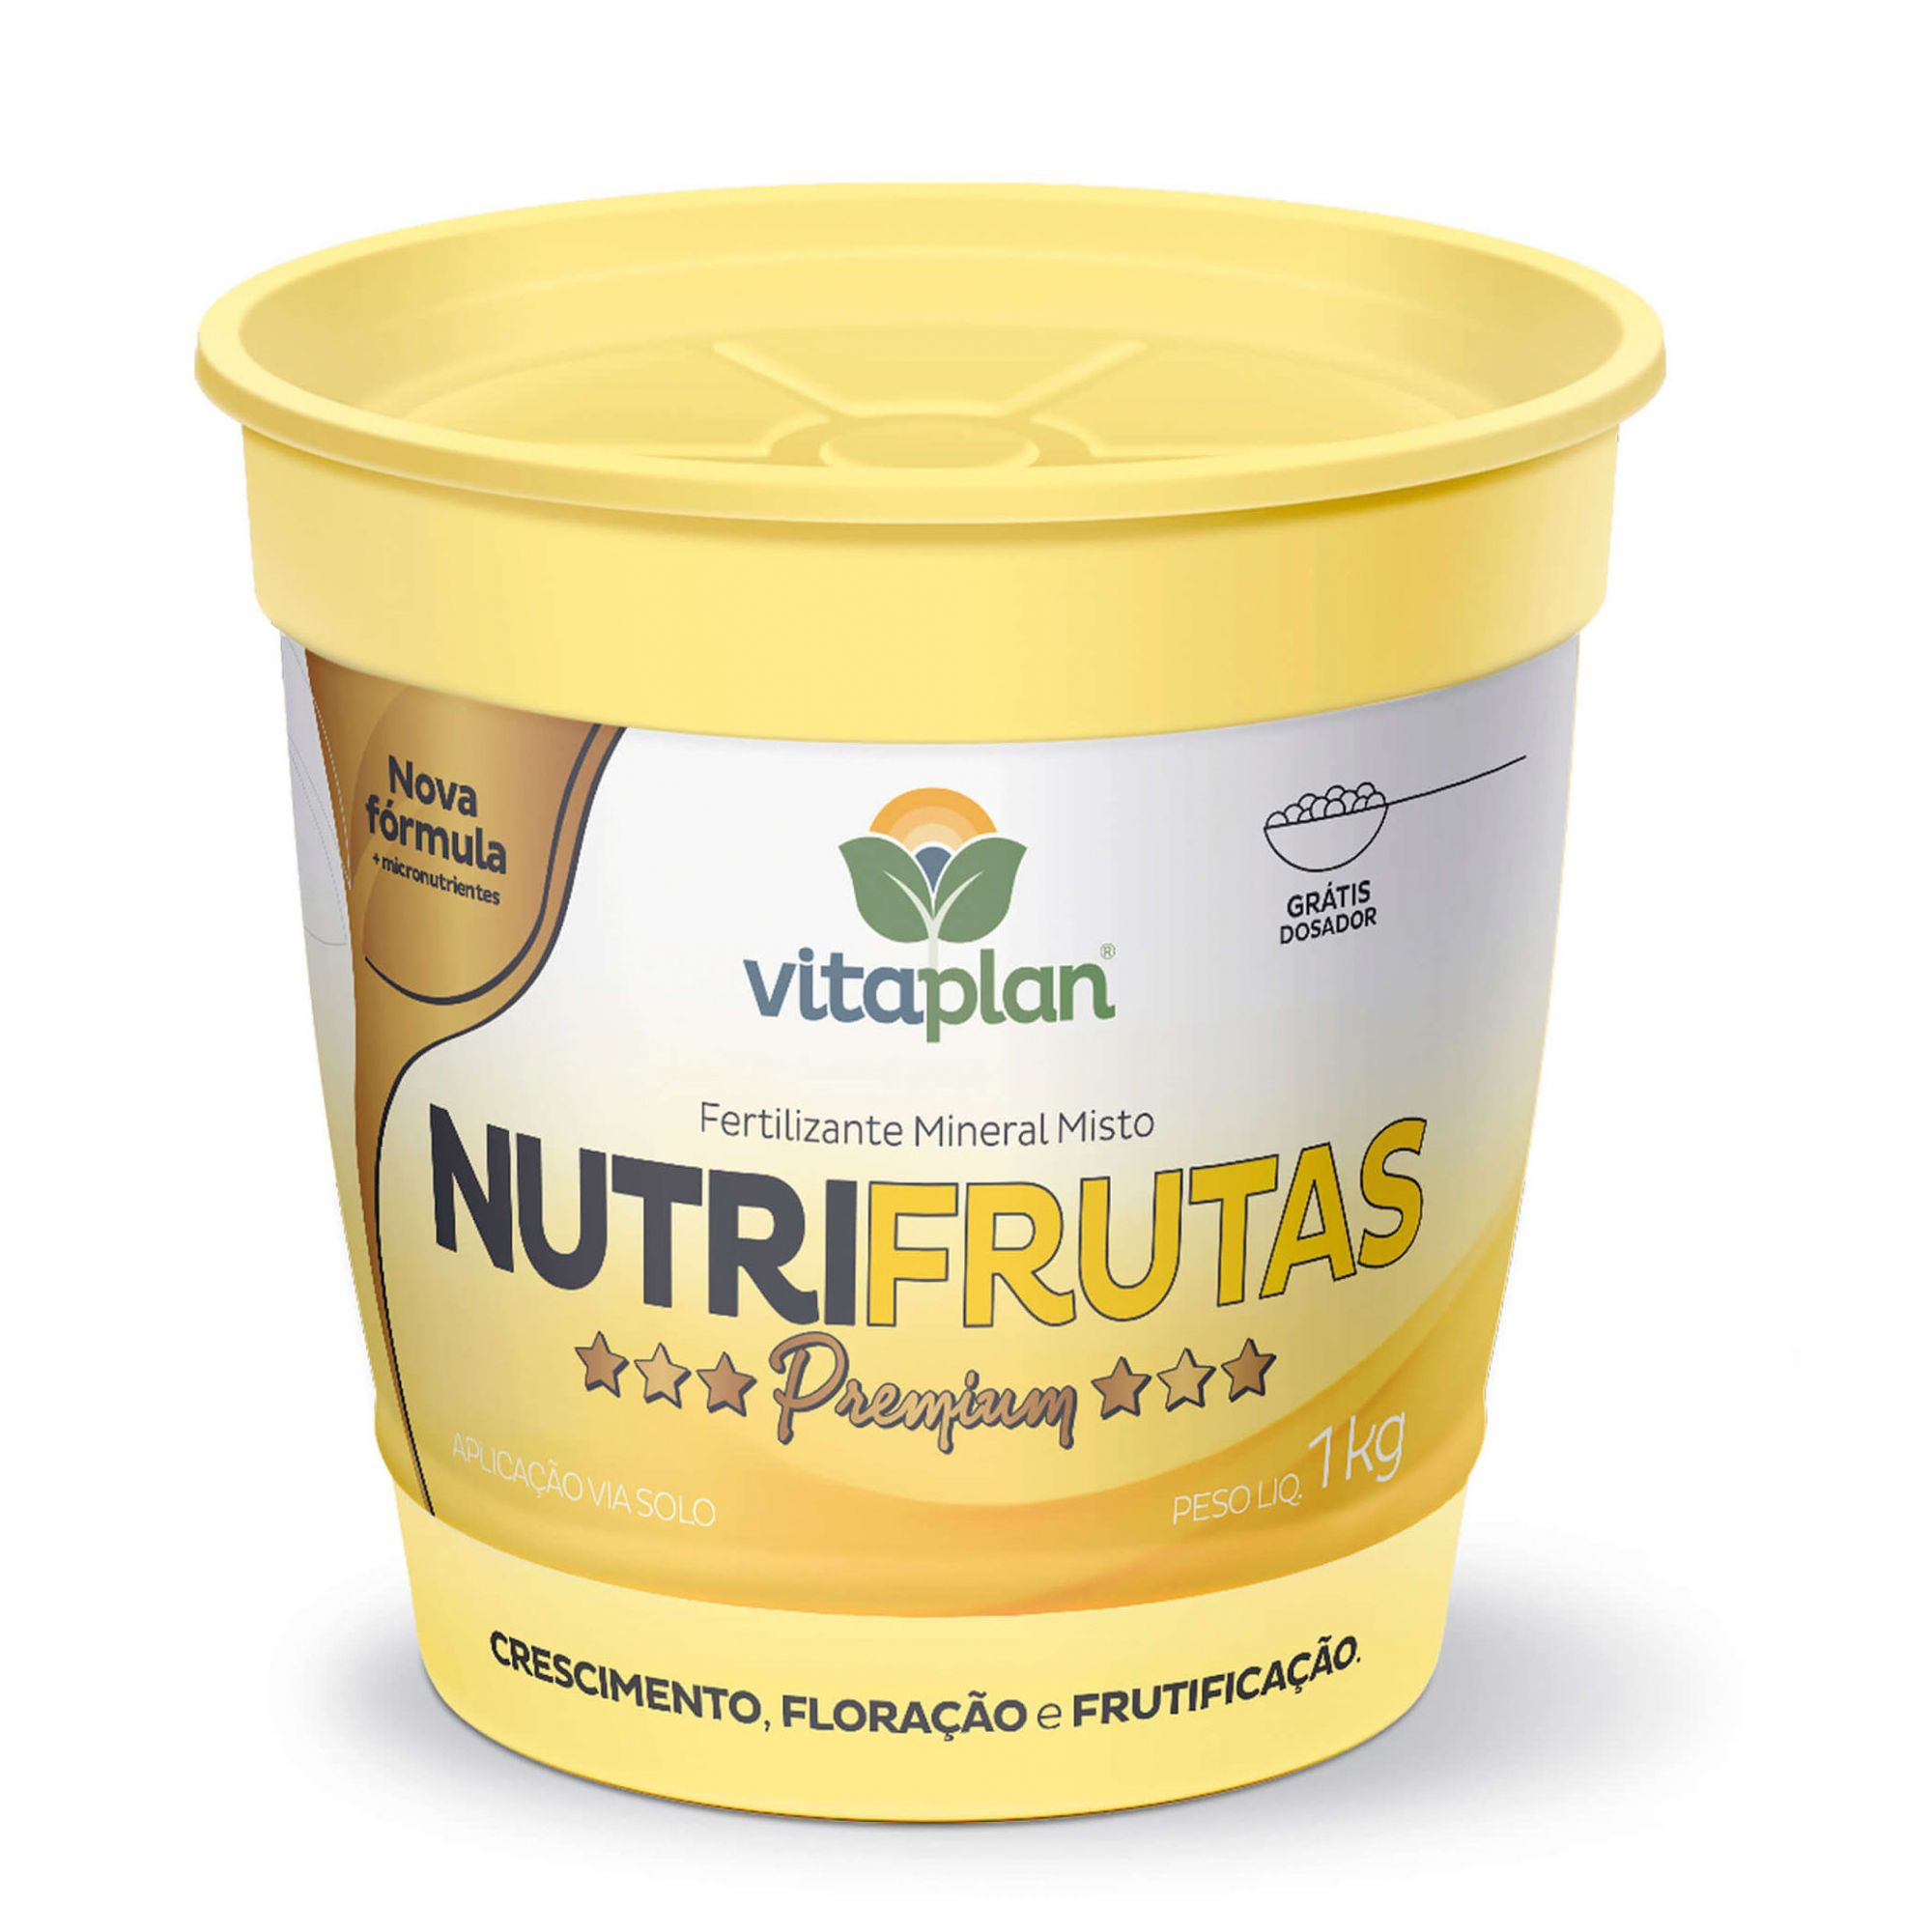 Fertilizante Mineral Misto Nutrifrutas 1kg - Vitaplan Premium